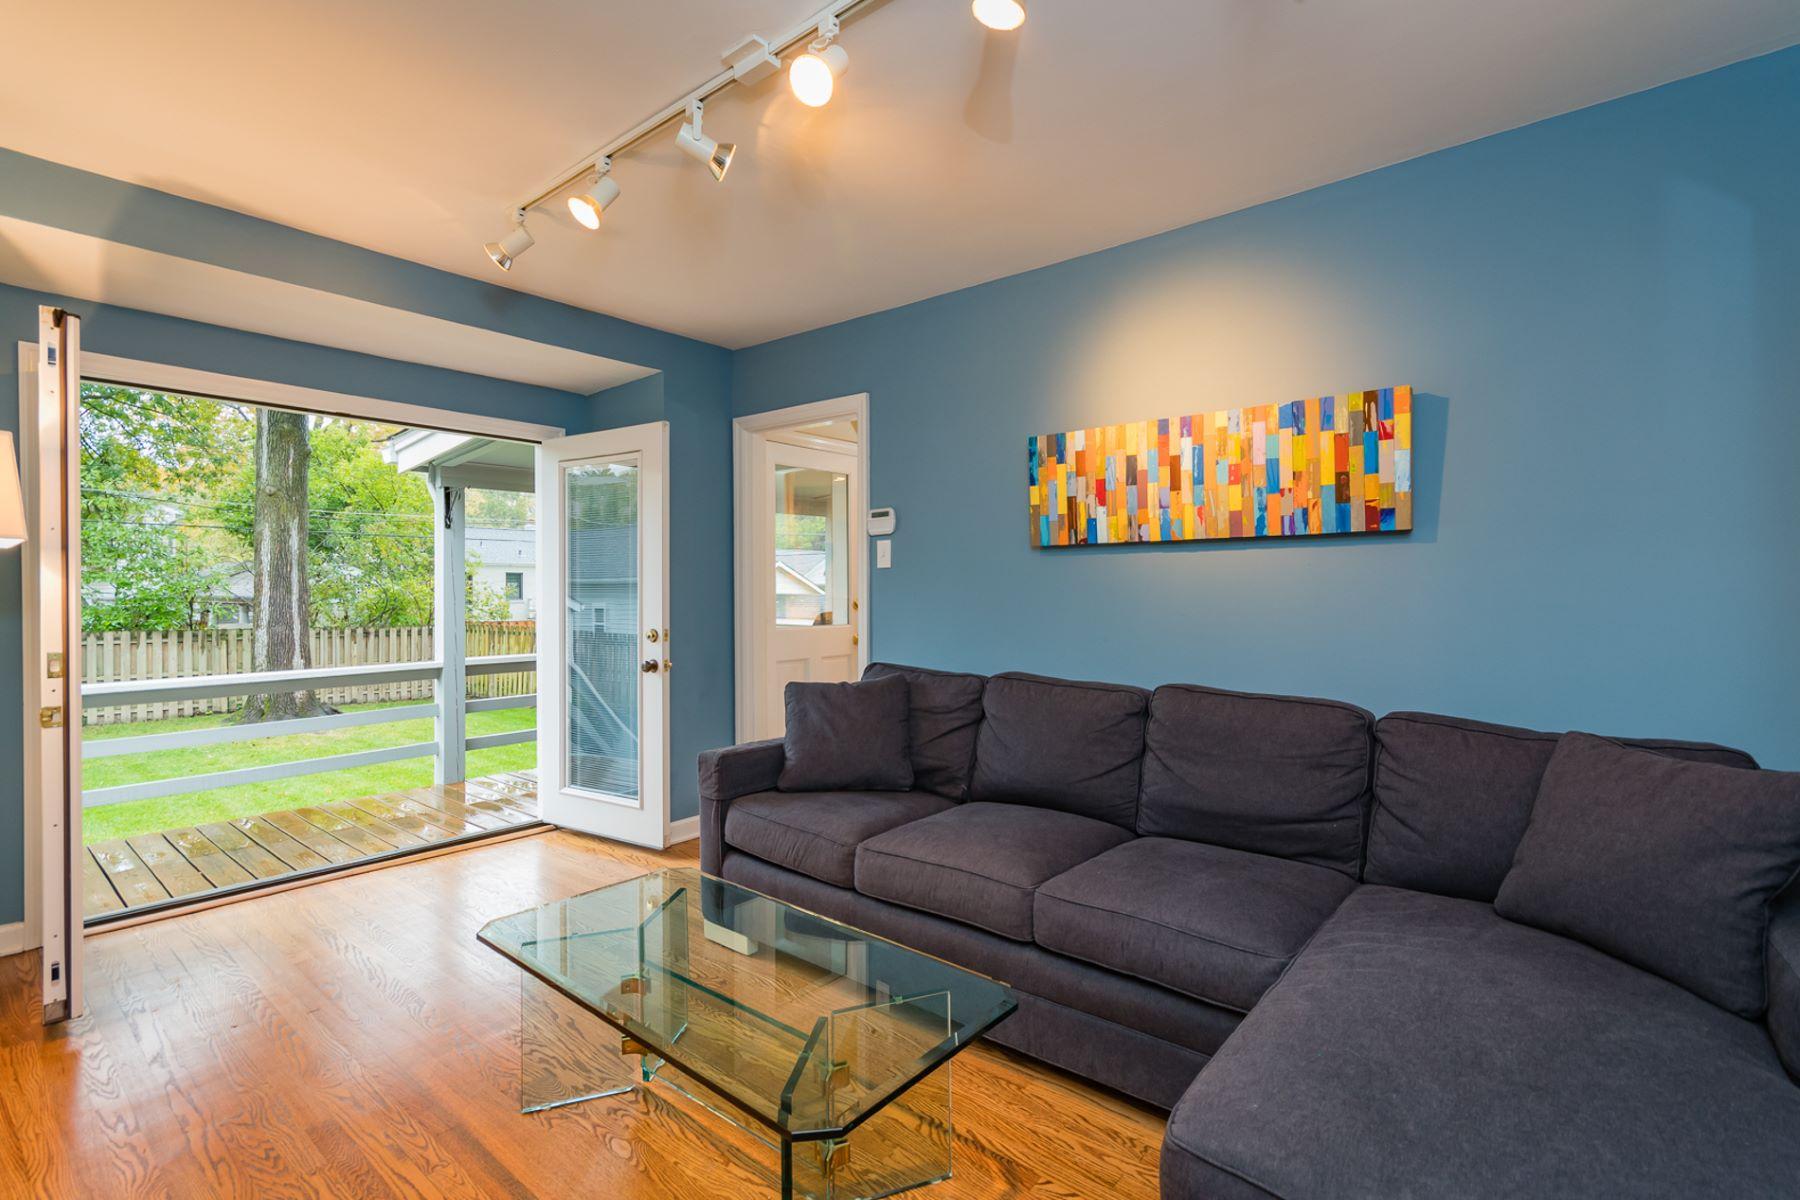 Additional photo for property listing at Midpark Lane 24 Midpark Lane Ladue, Missouri 63124 United States